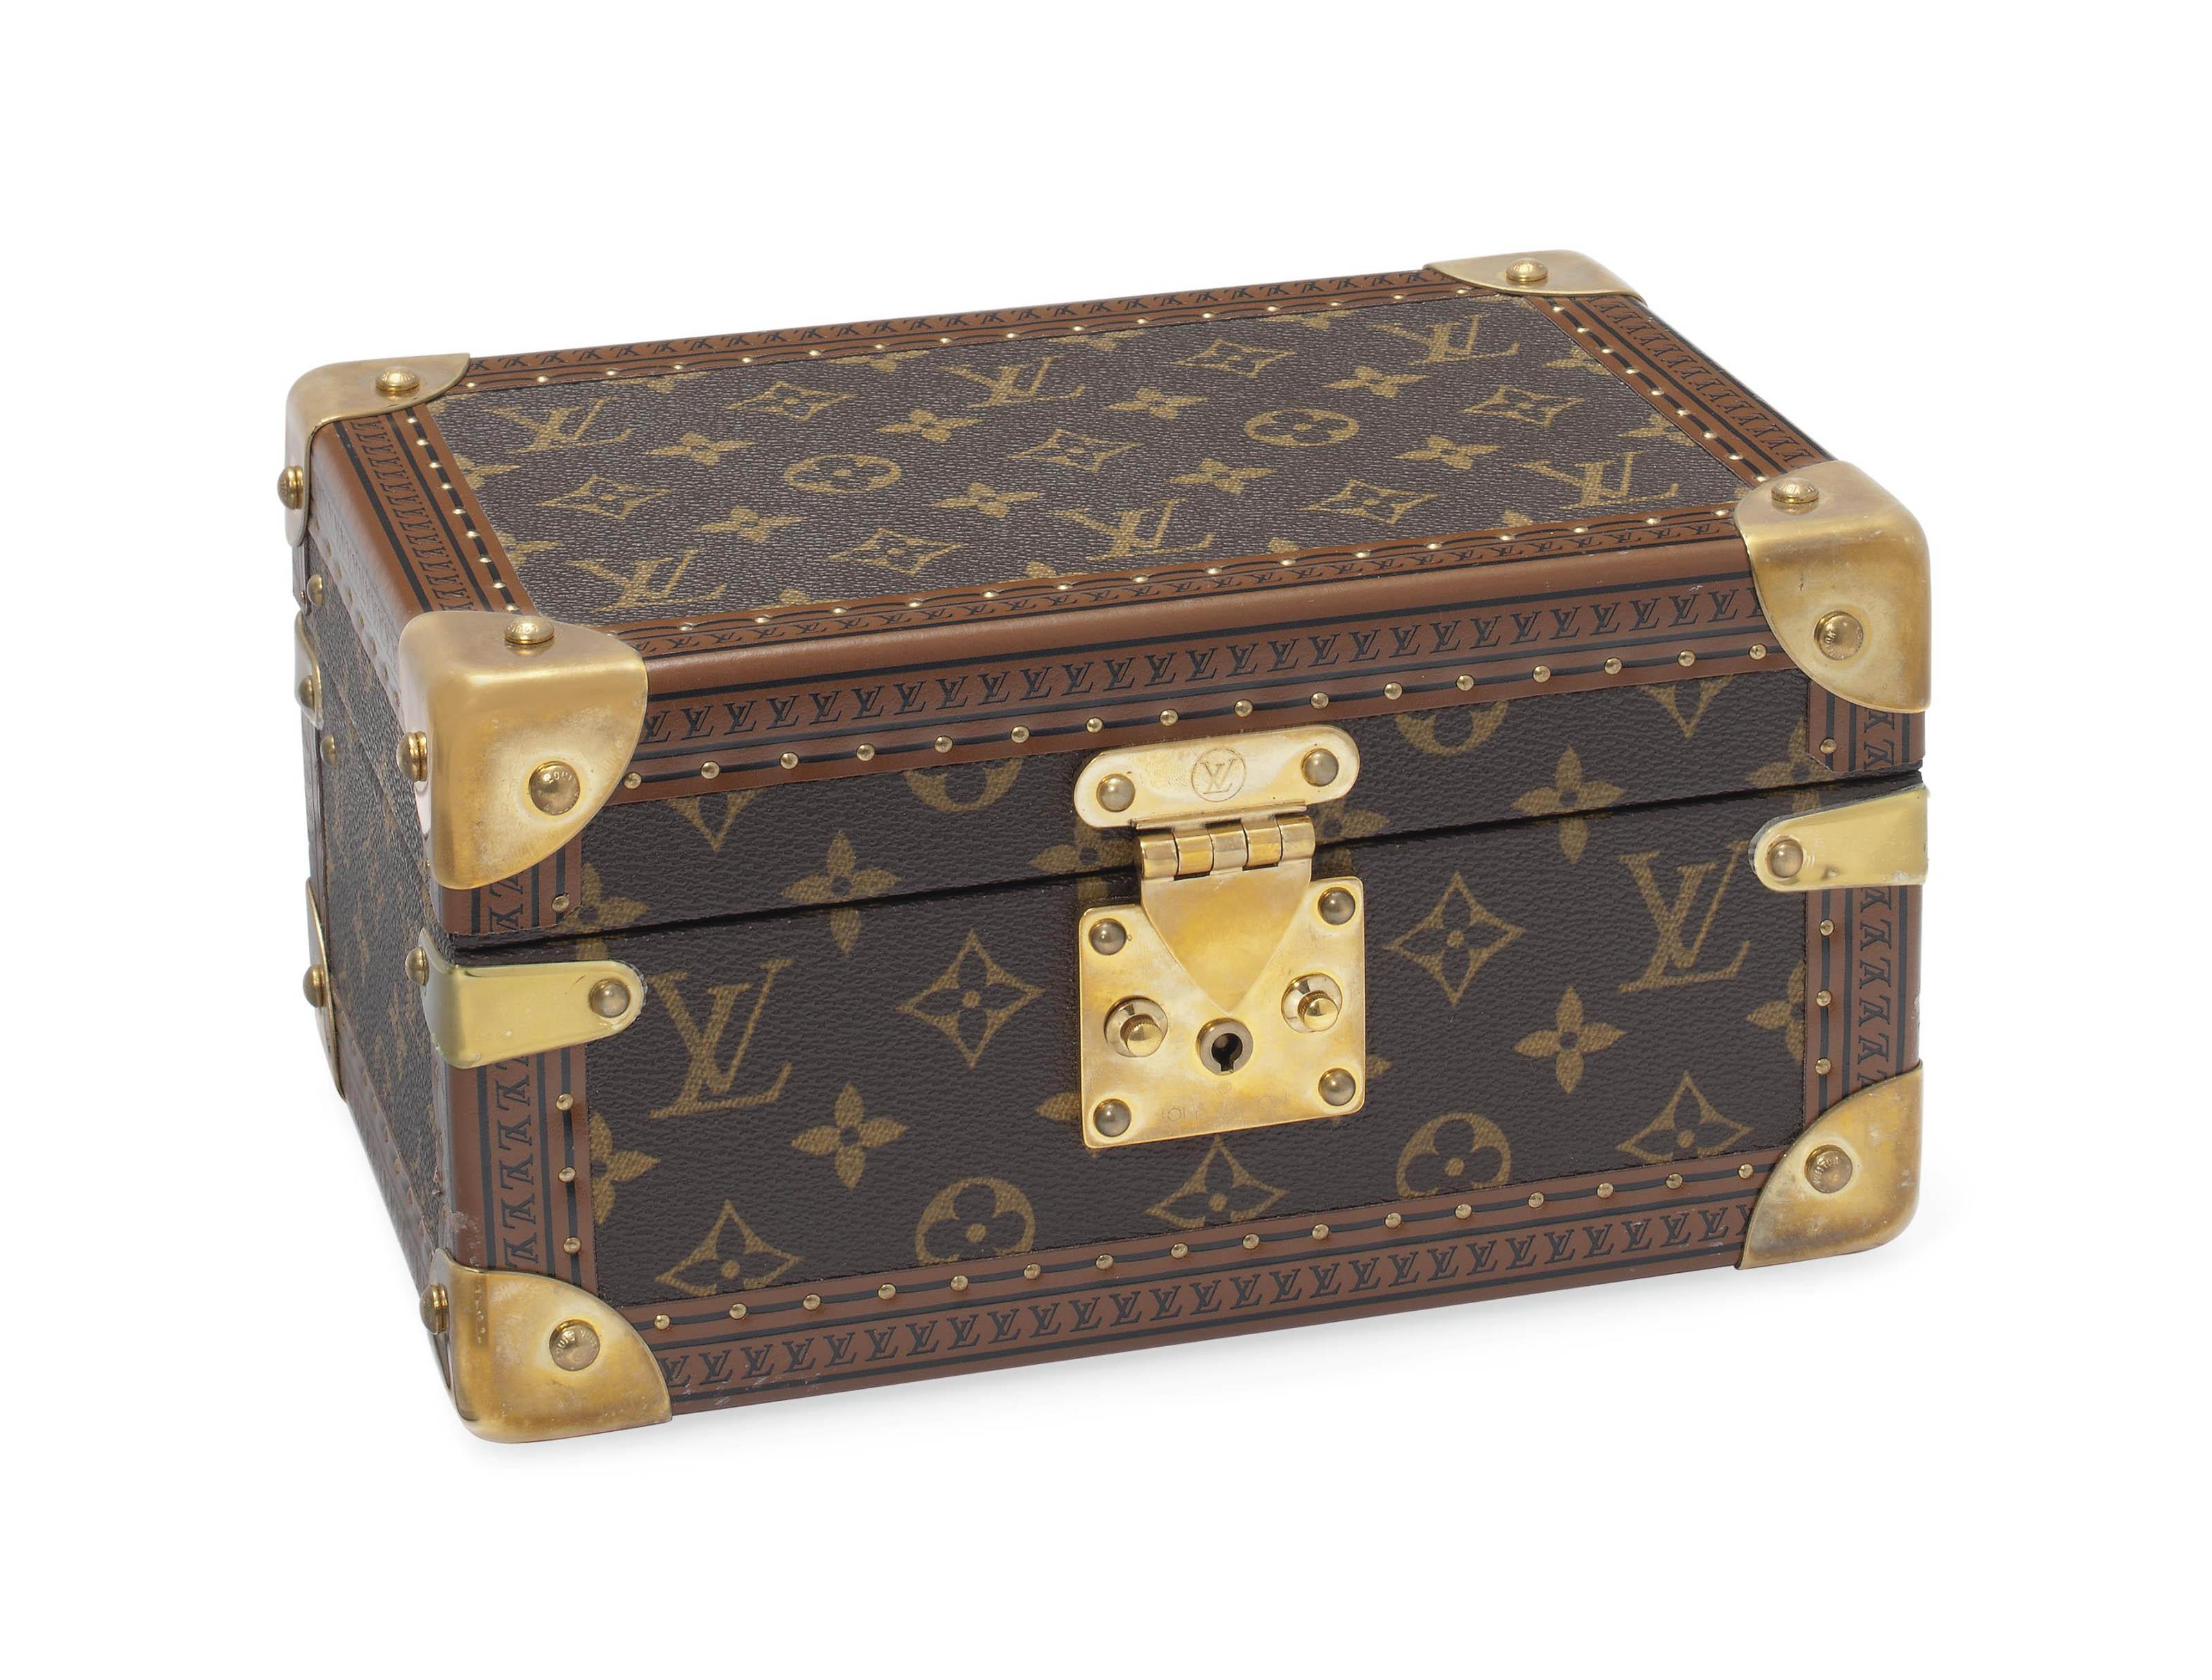 A JEWELLERY BOX IN MONOGRAM CANVAS LOUIS VUITTON 20TH CENTURY